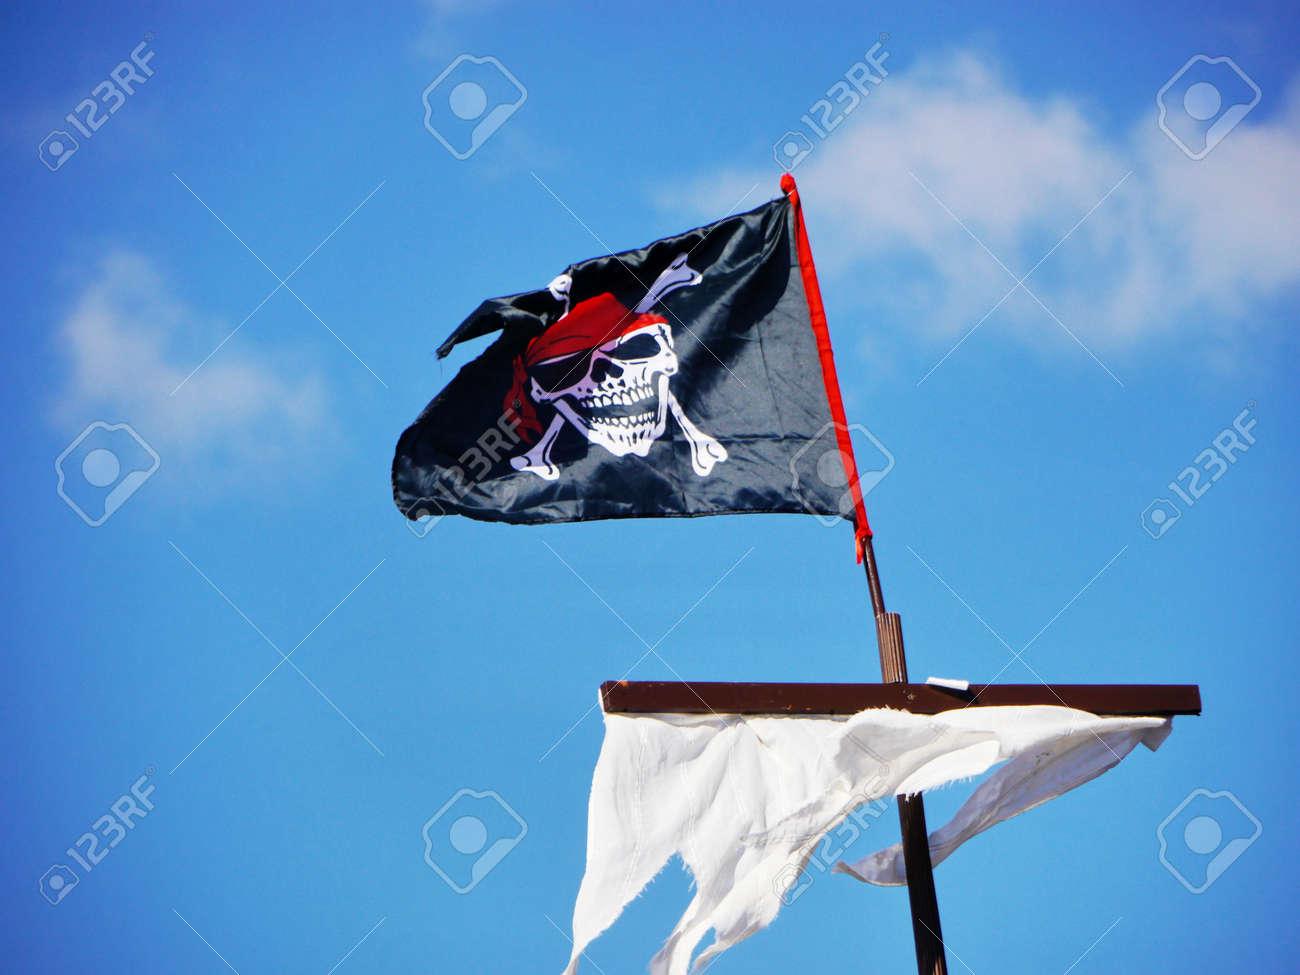 Jolly Roger skull and crossbones black pirate flag Stock Photo - 17551163